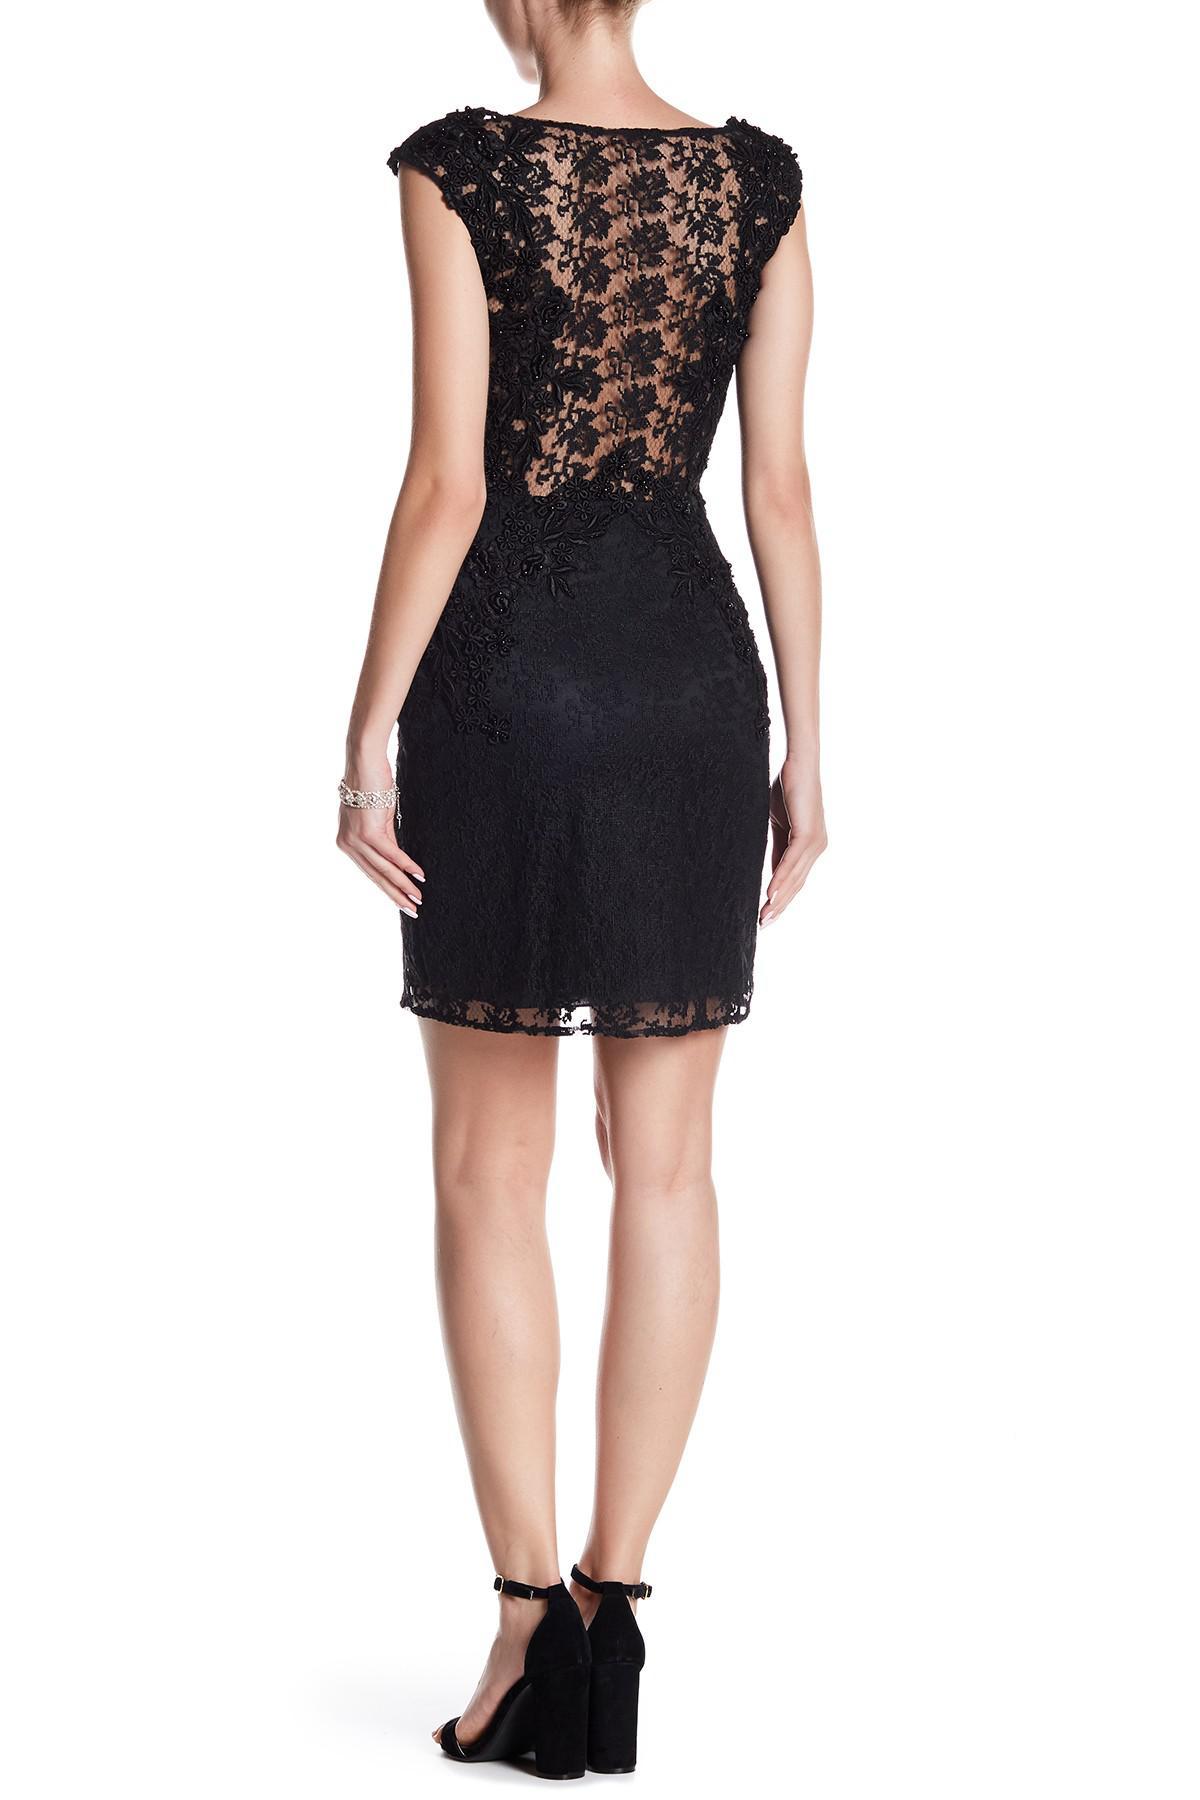 84da863483b5f basix black label BLACK Beaded Sleeveless Dress